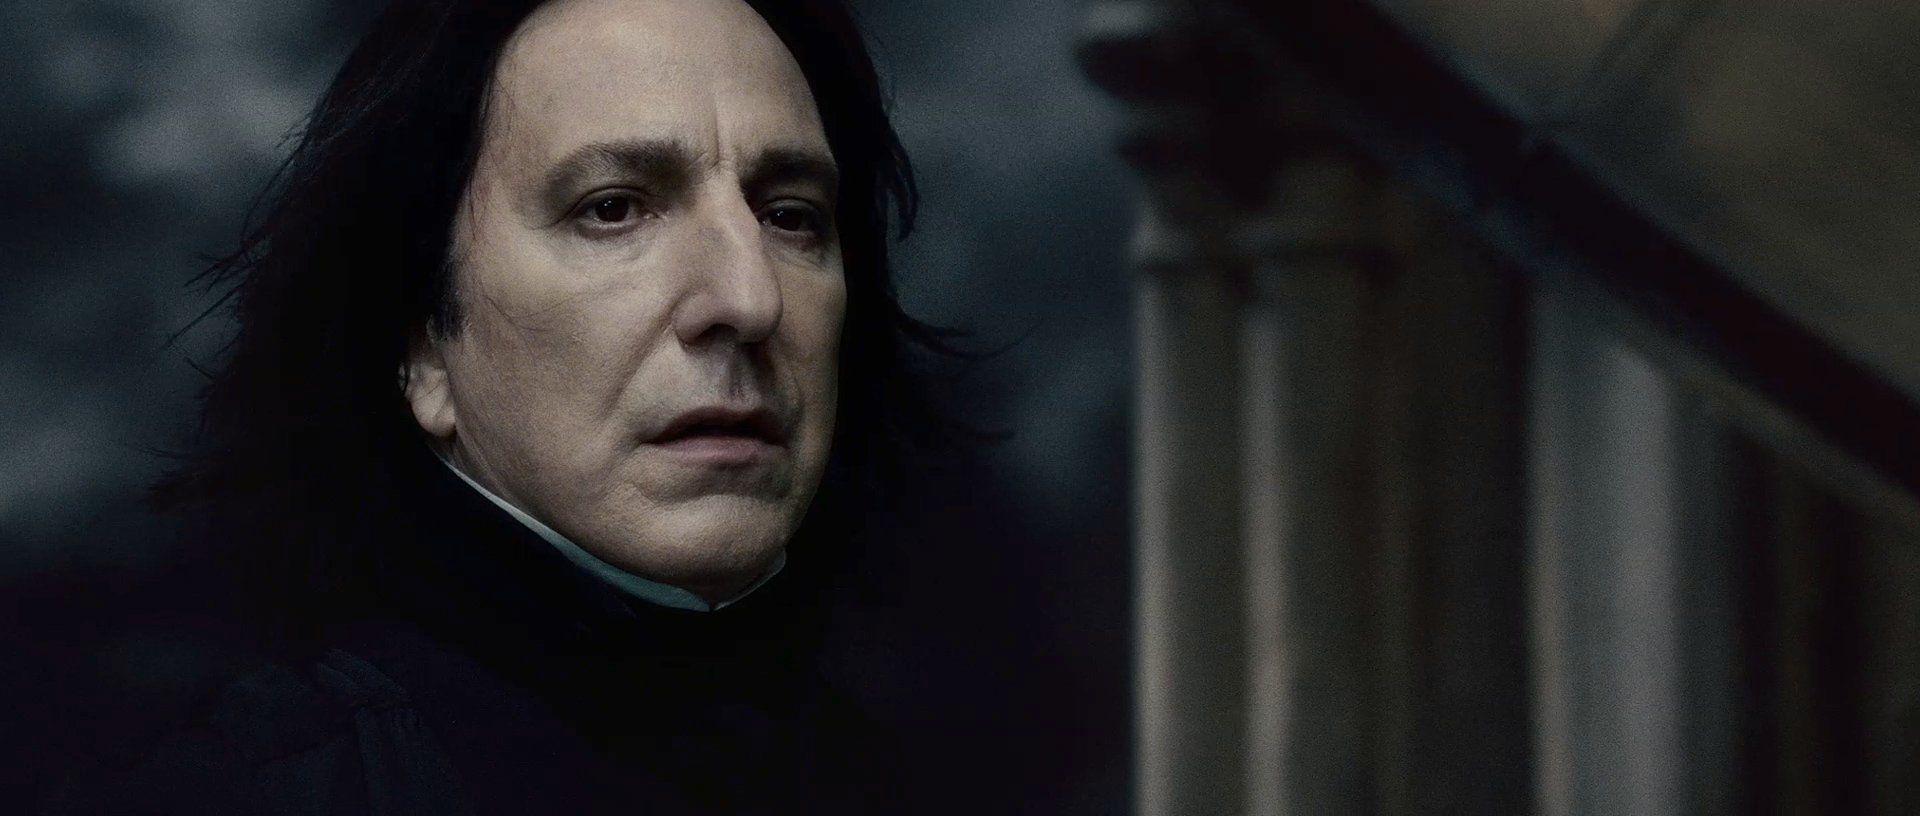 Promotional - scnet hp6promo 103 - Harry Potter Screencaps | Alan ...